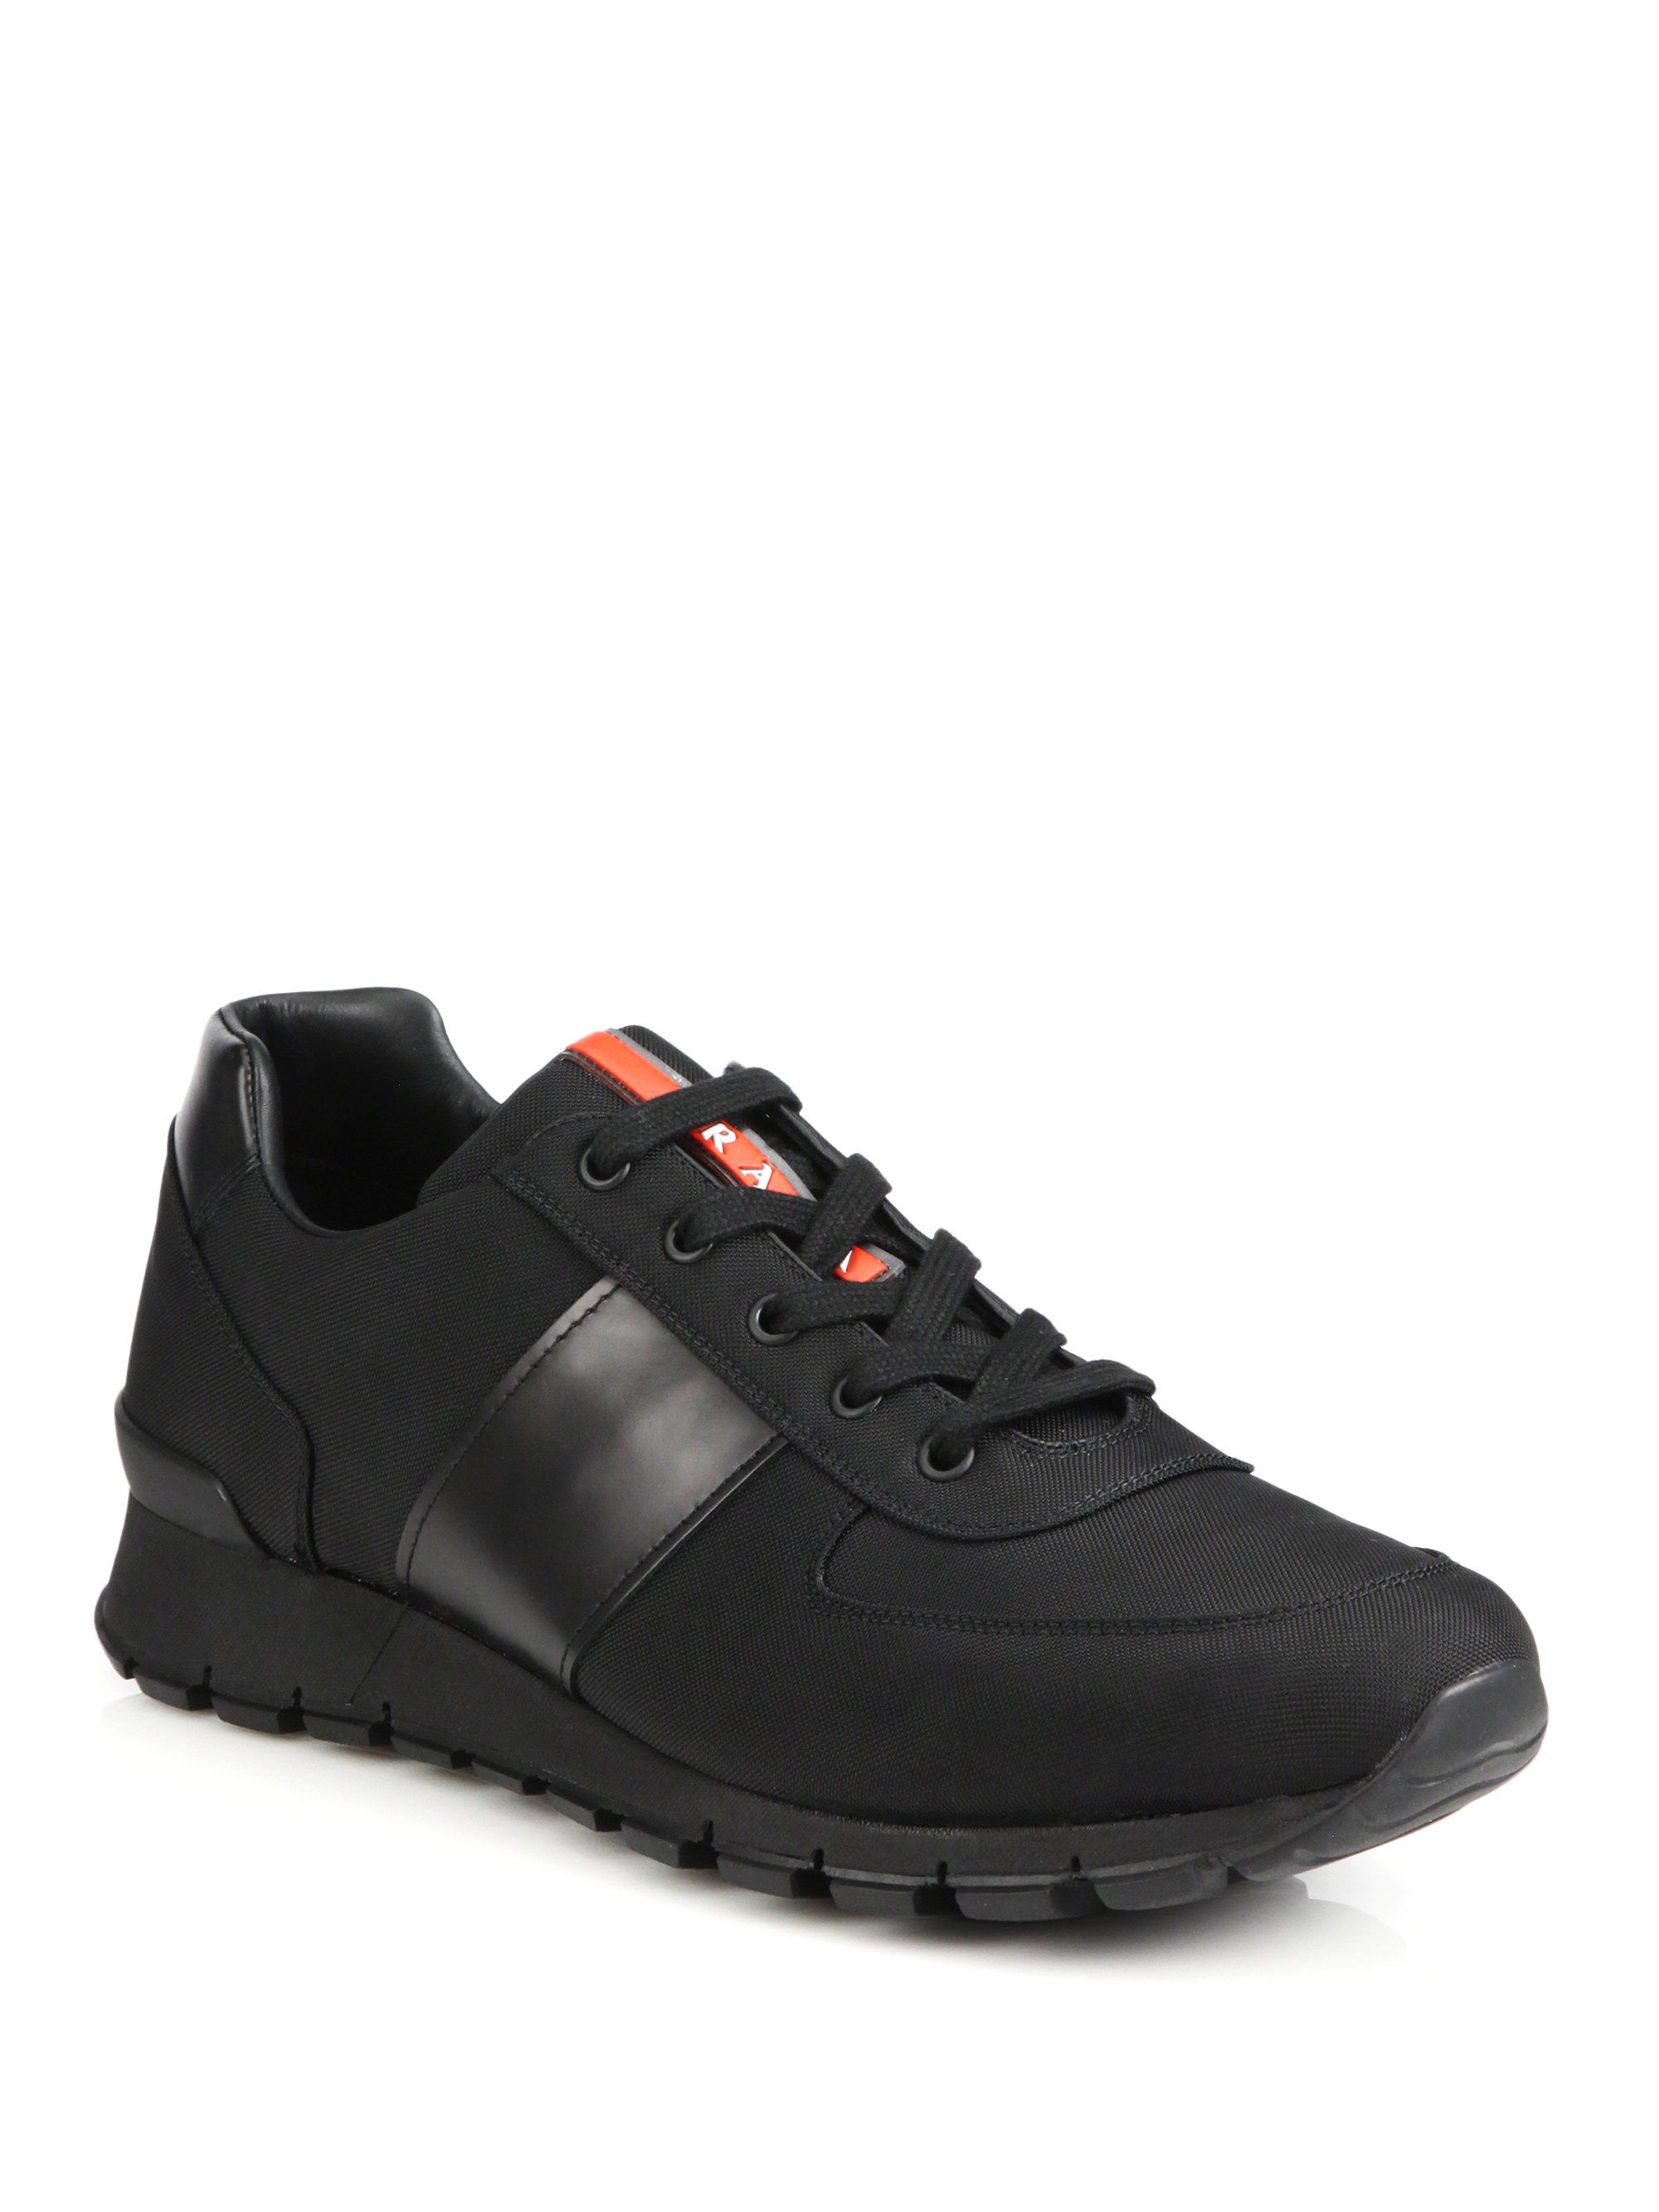 Lyst - Prada Spazzolato Running Sneakers in Black